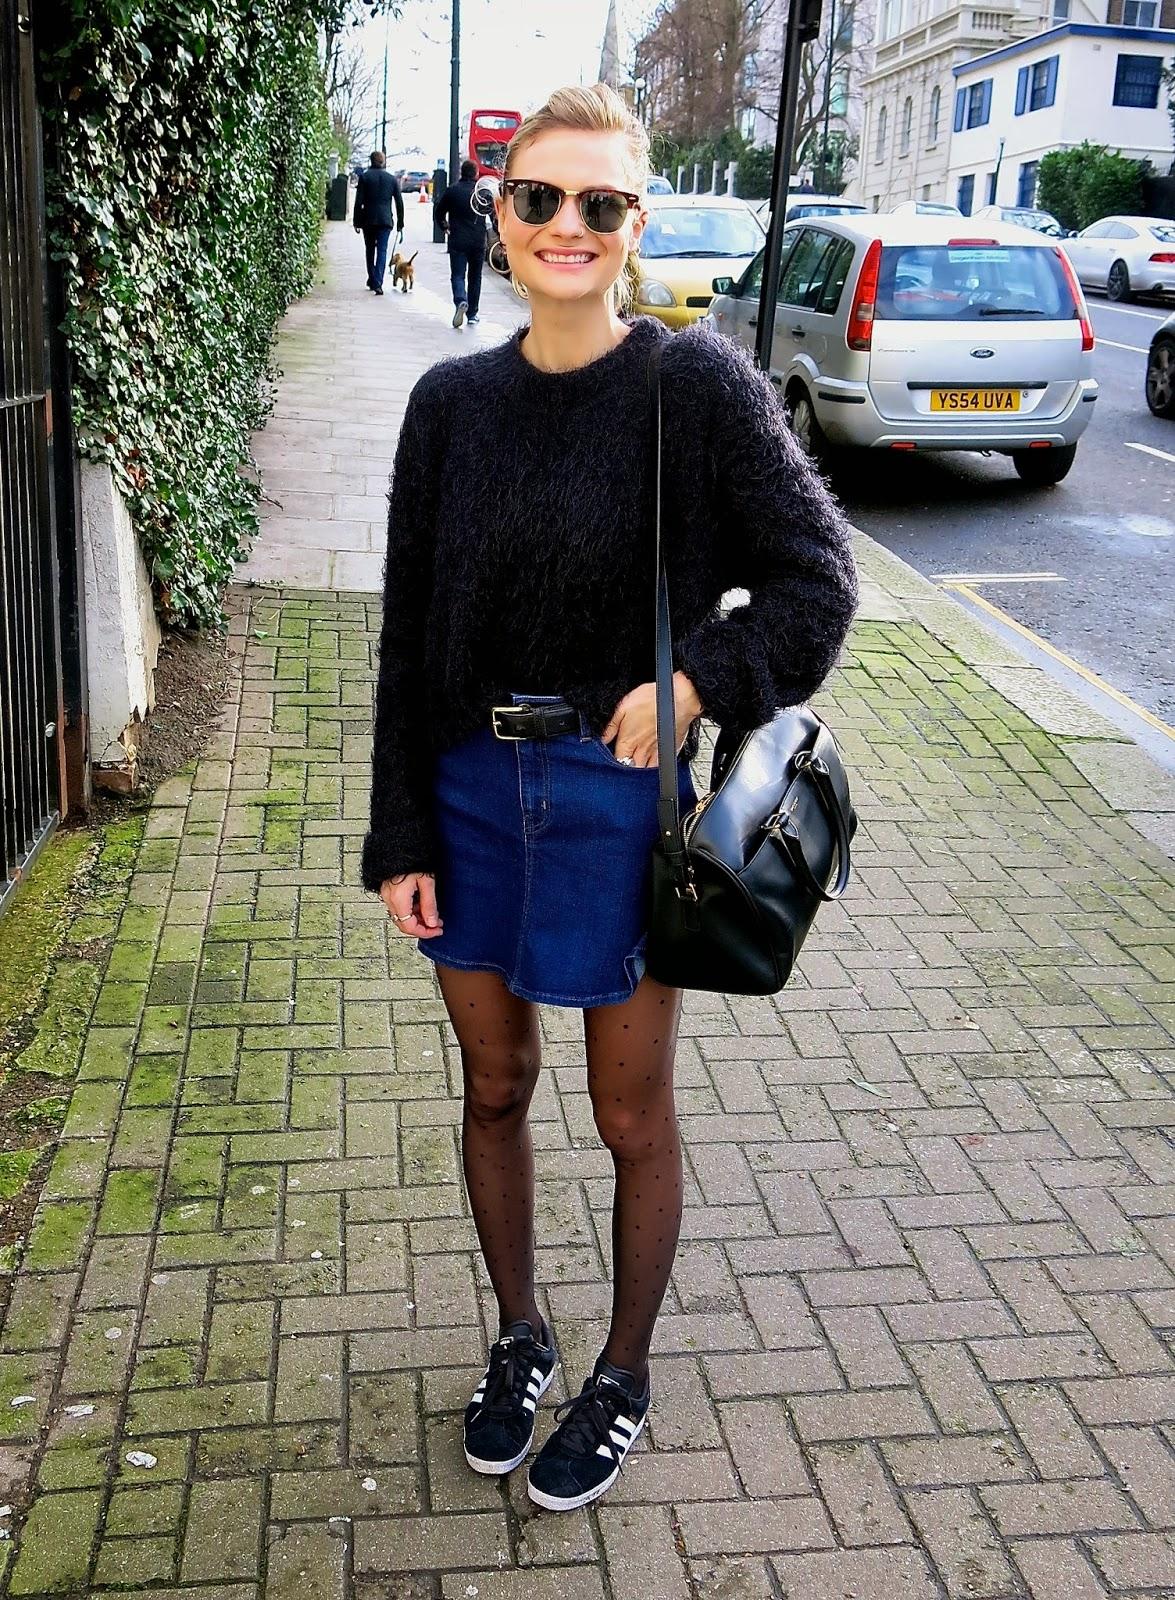 980754698e6c1 I am wearing an H&M coat, an Urban Outfitters knit, a vintage belt, Zara  denim skirt, Tabio polkadot tights, Adidas Gazelles II, tortoiseshell  RayBan ...